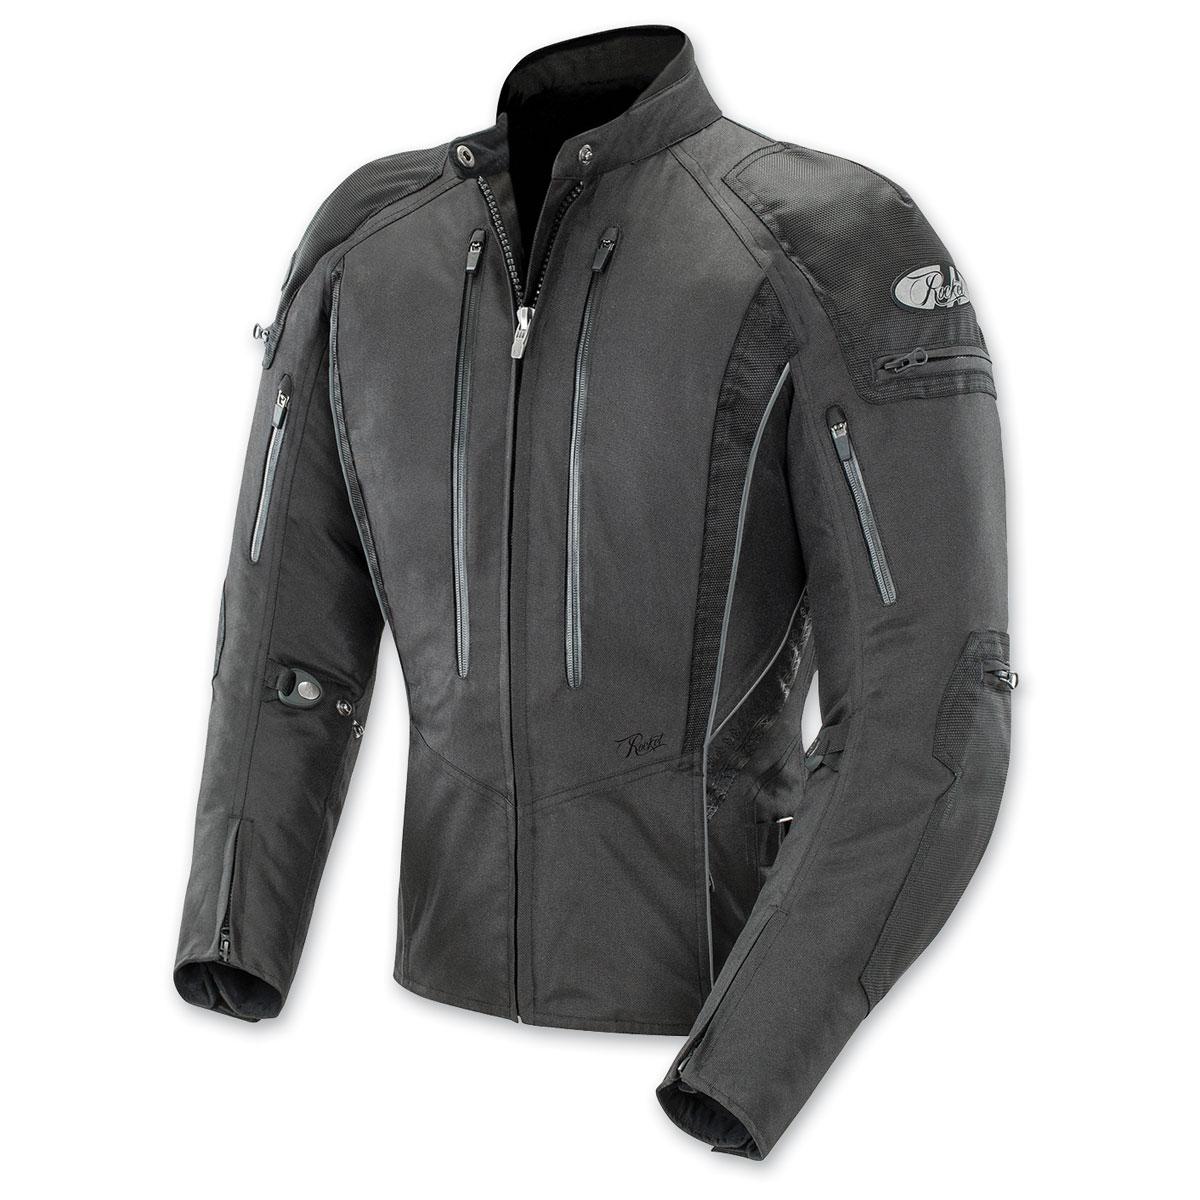 Joe Rocket Women's Atomic 5.0 Black Jacket